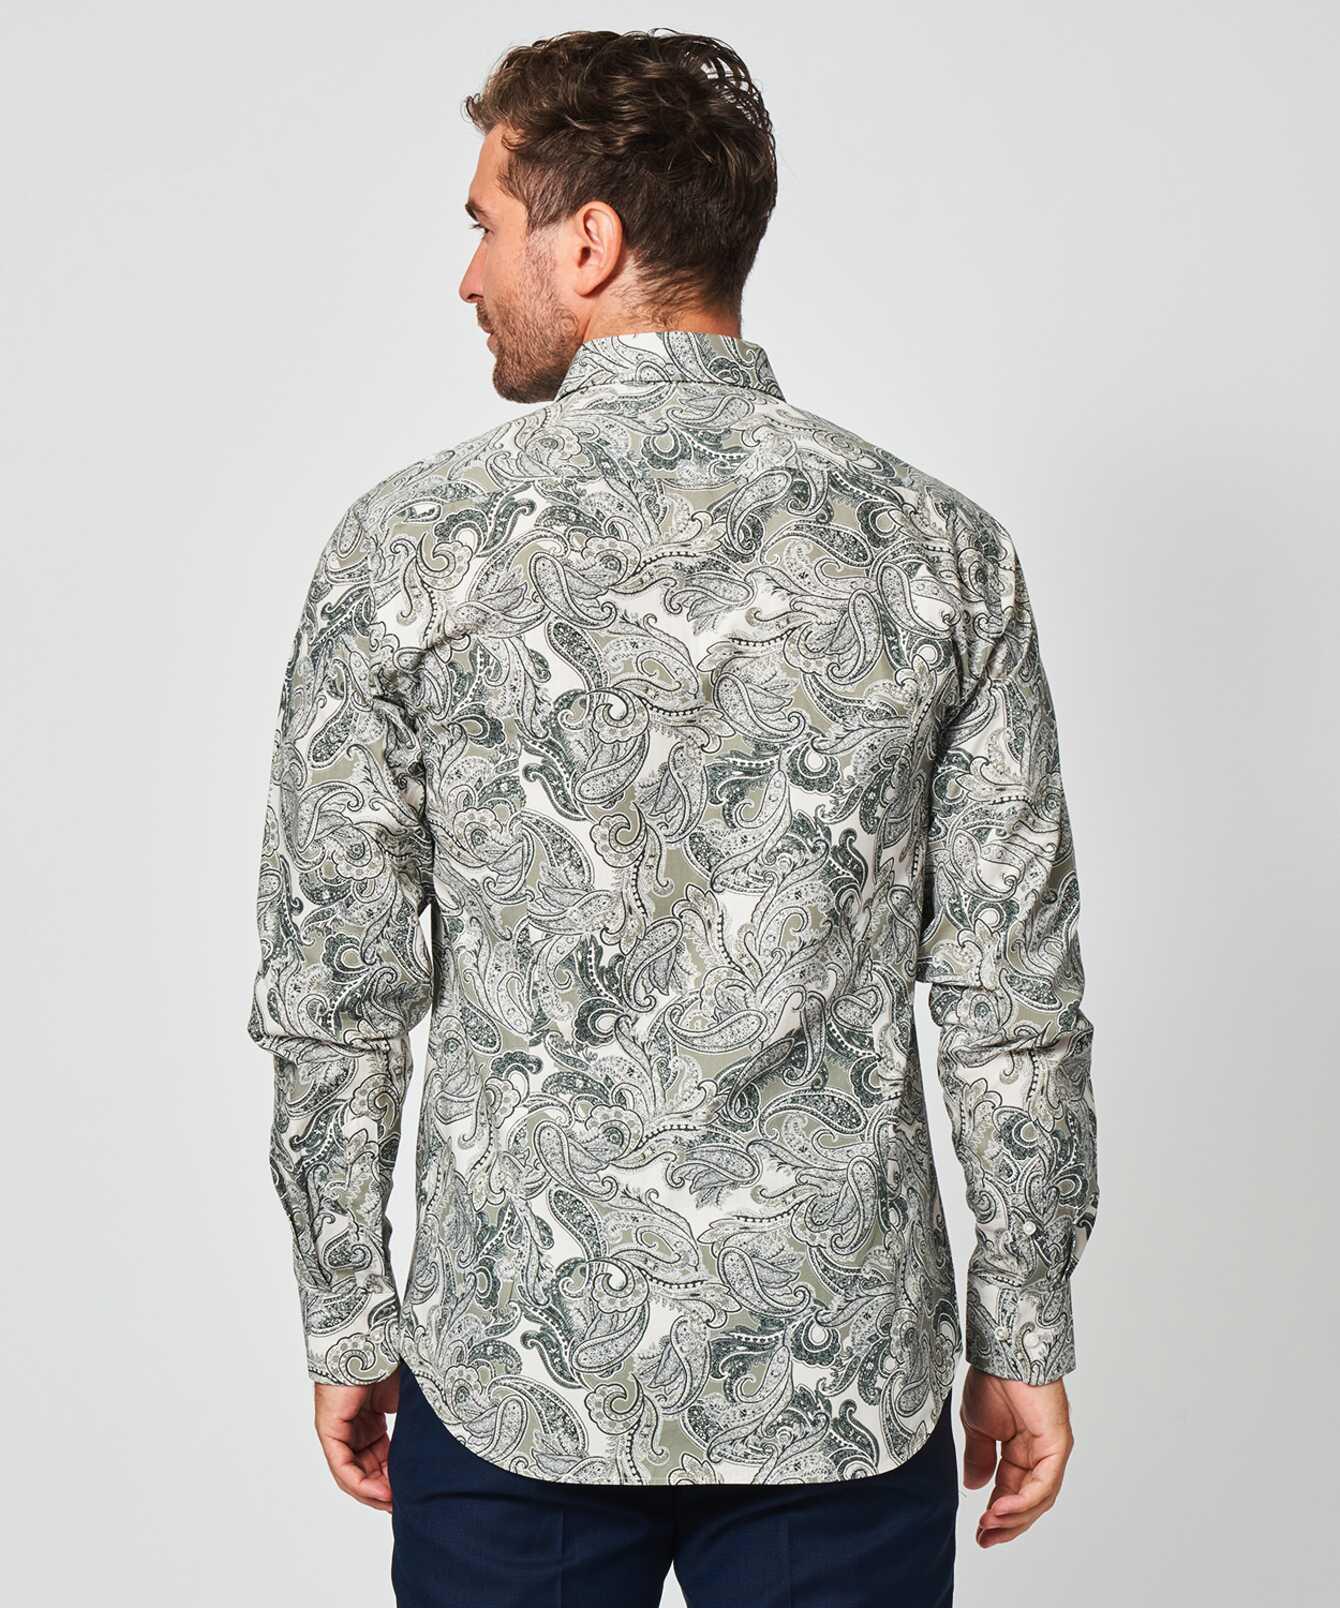 Skjorta Paisley Grön  The Shirt Factory